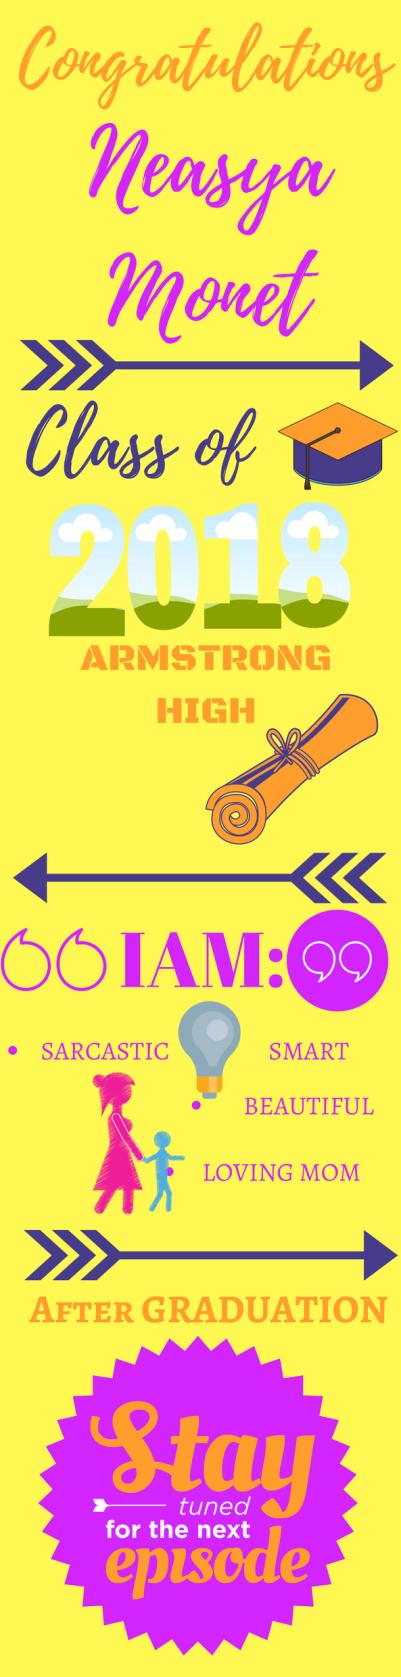 High School Grad Infographic